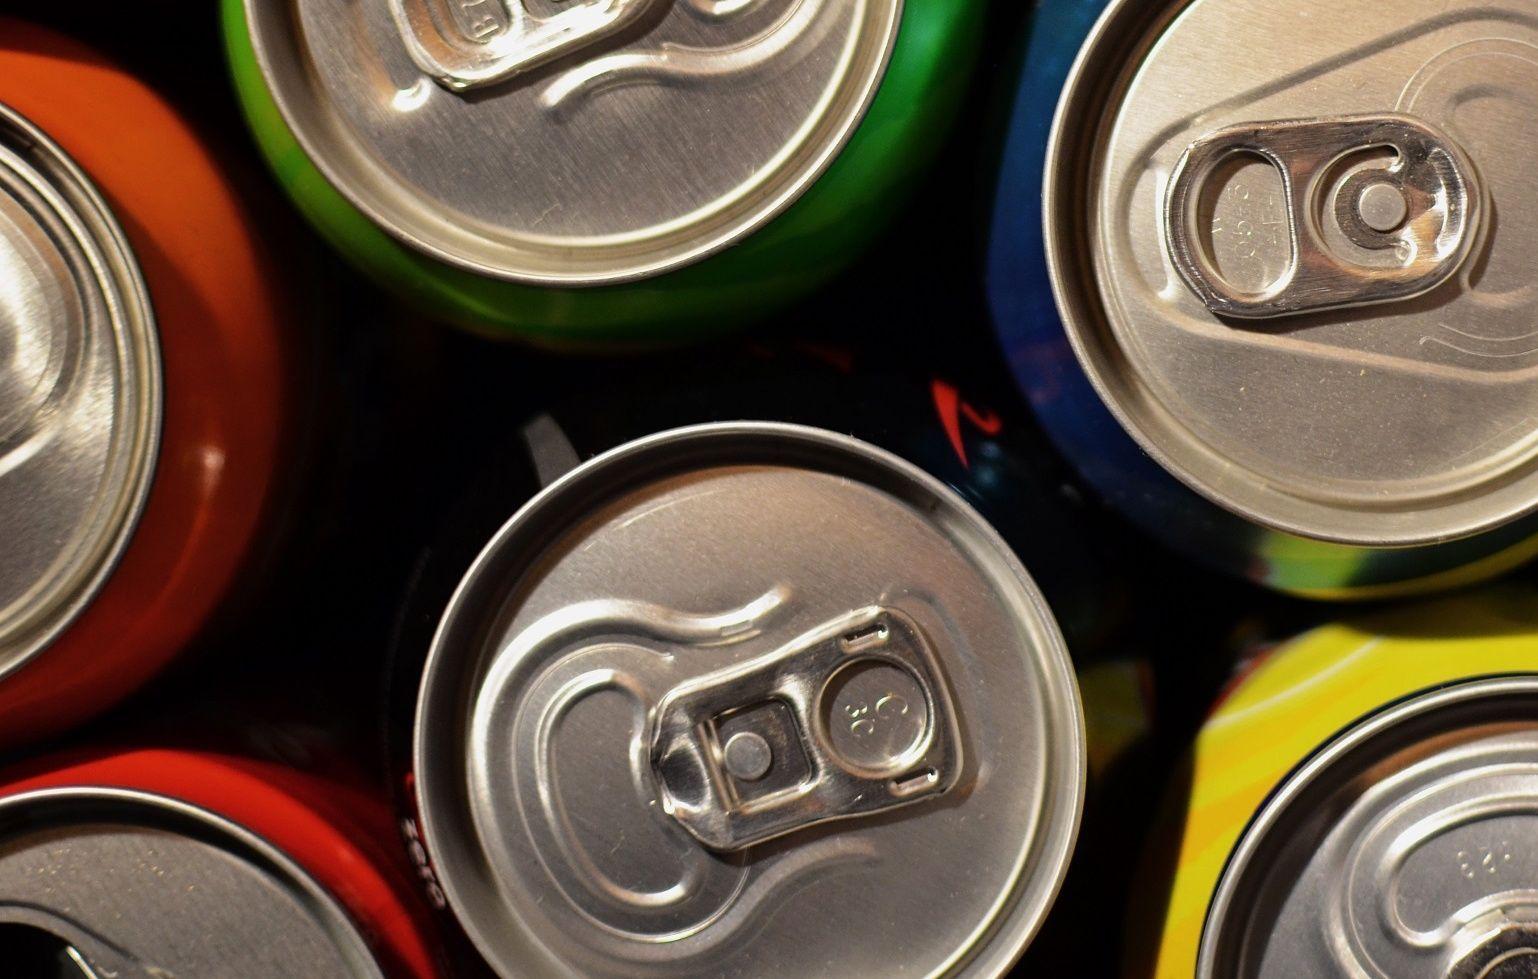 epatite acuta energy drink